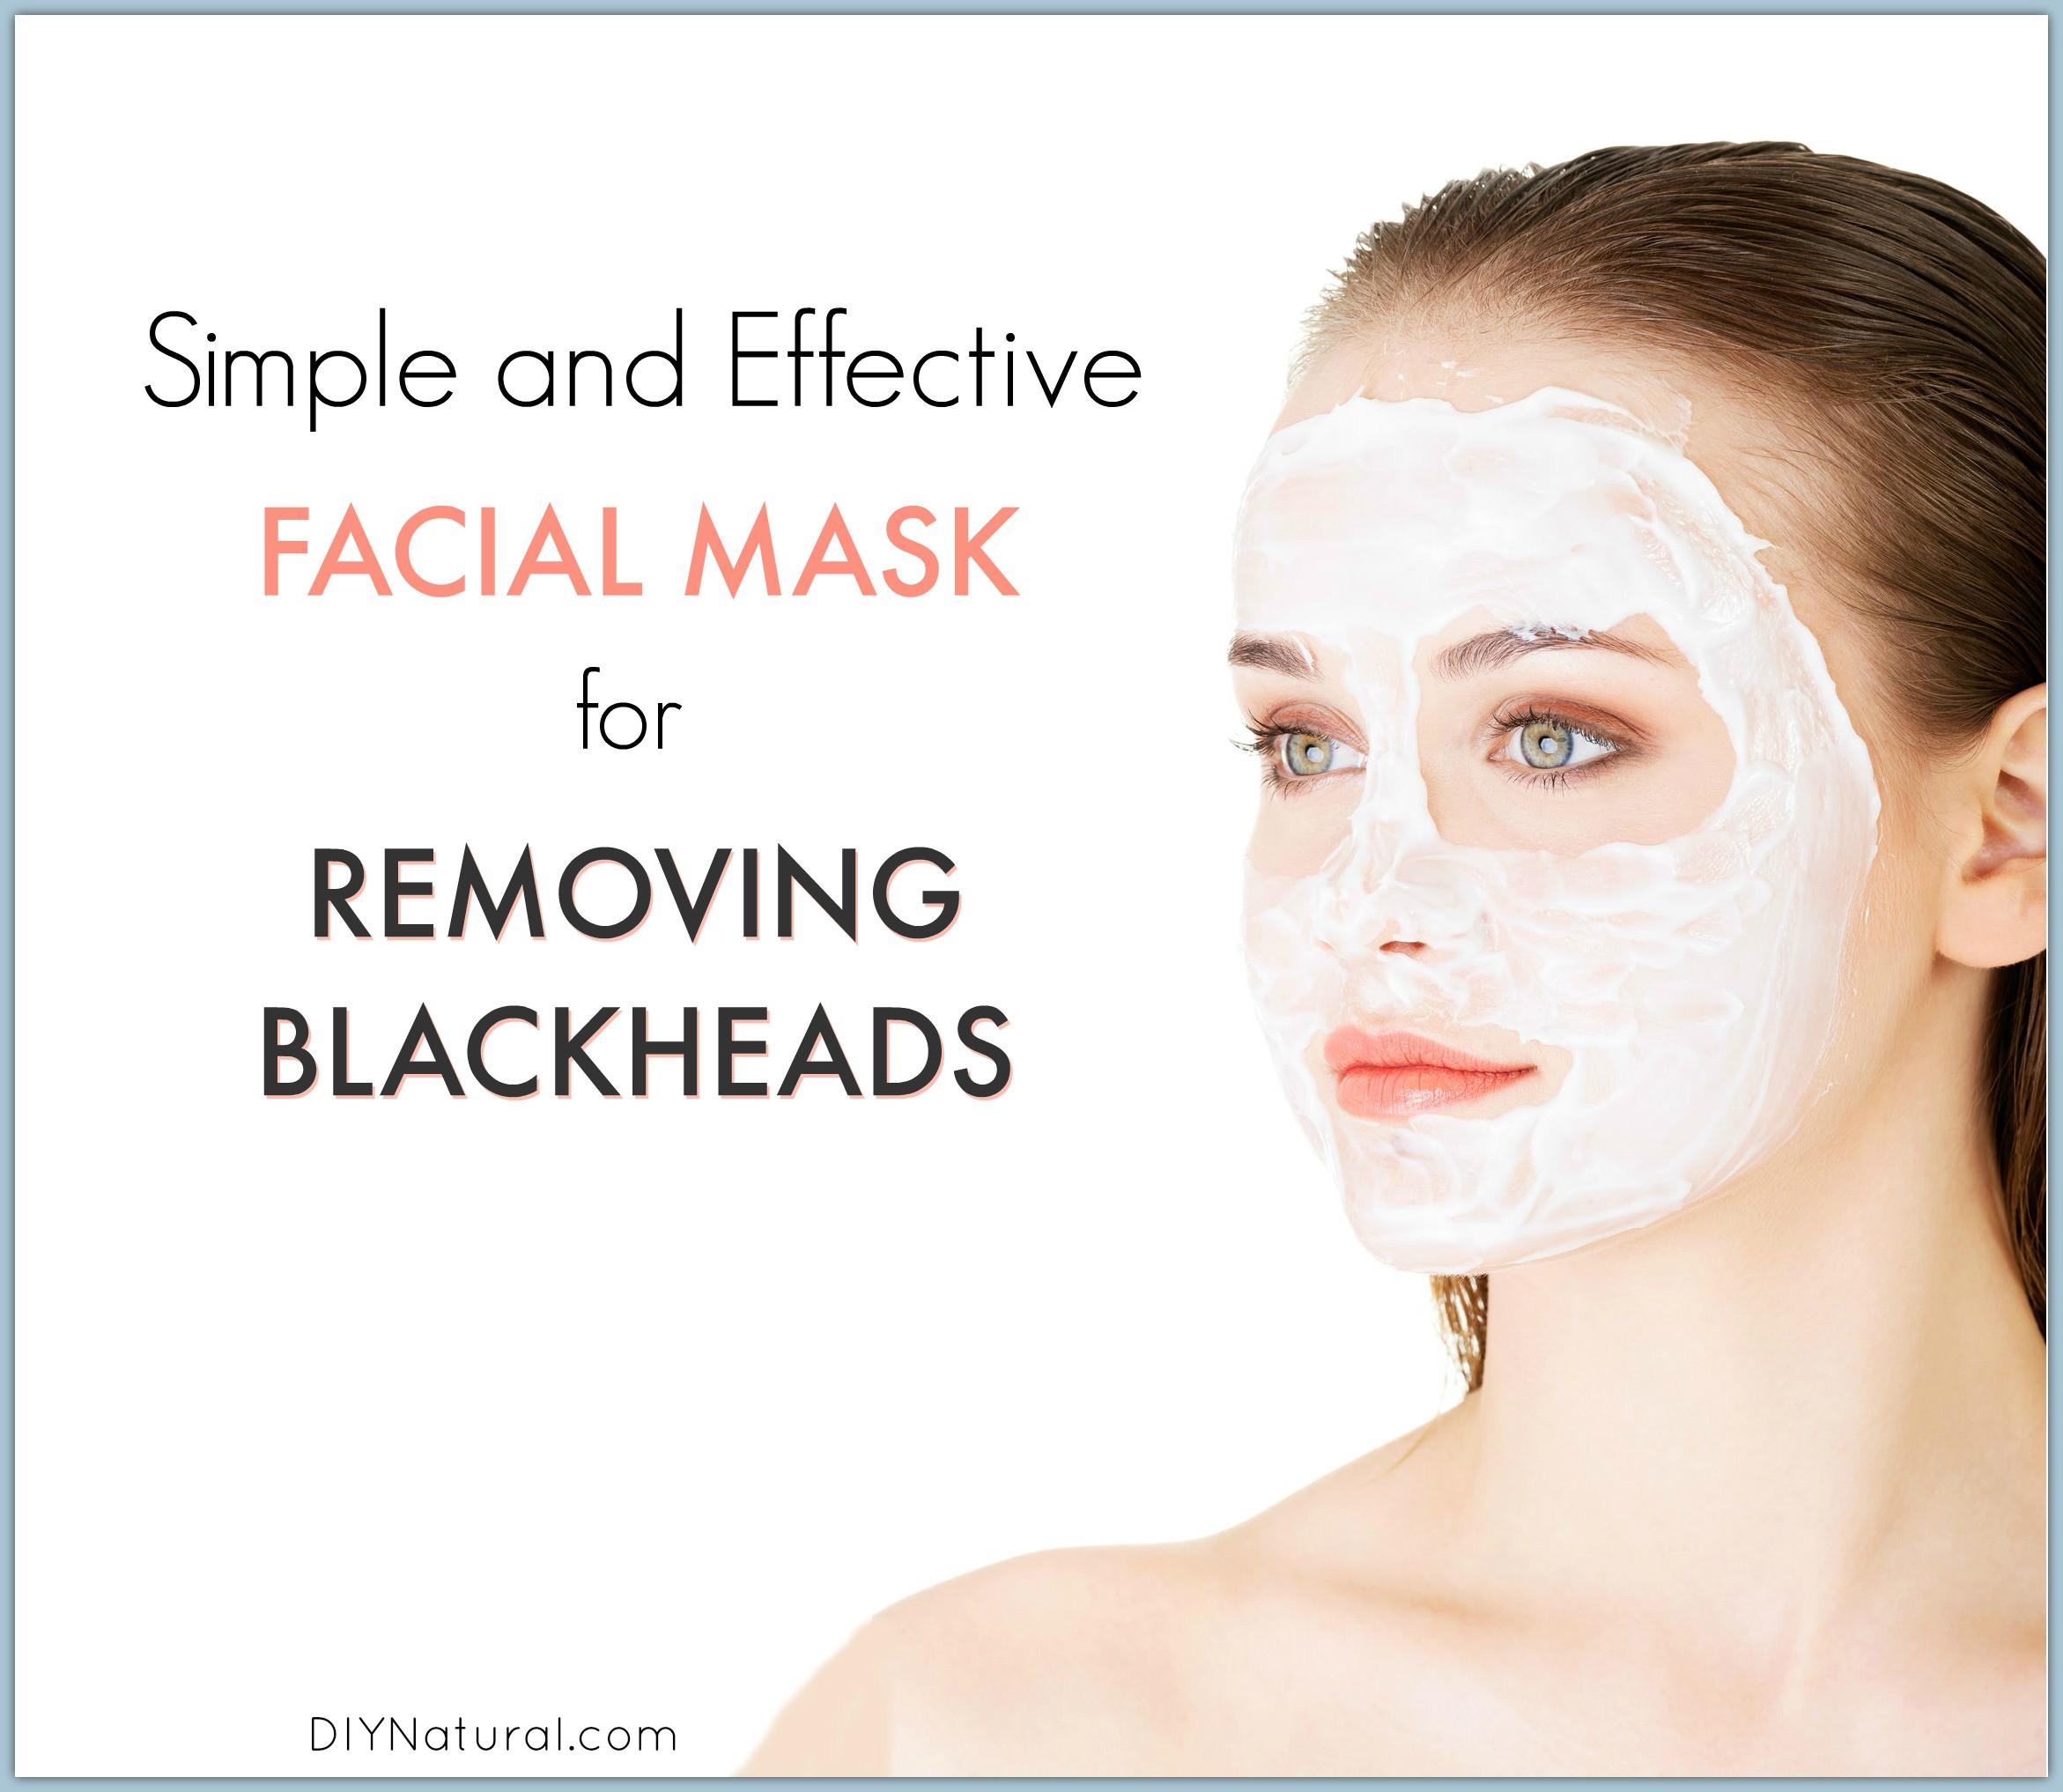 Anti Blackhead Maske Diy  Blackheads A Quick and Easy Homemade Blackhead Mask